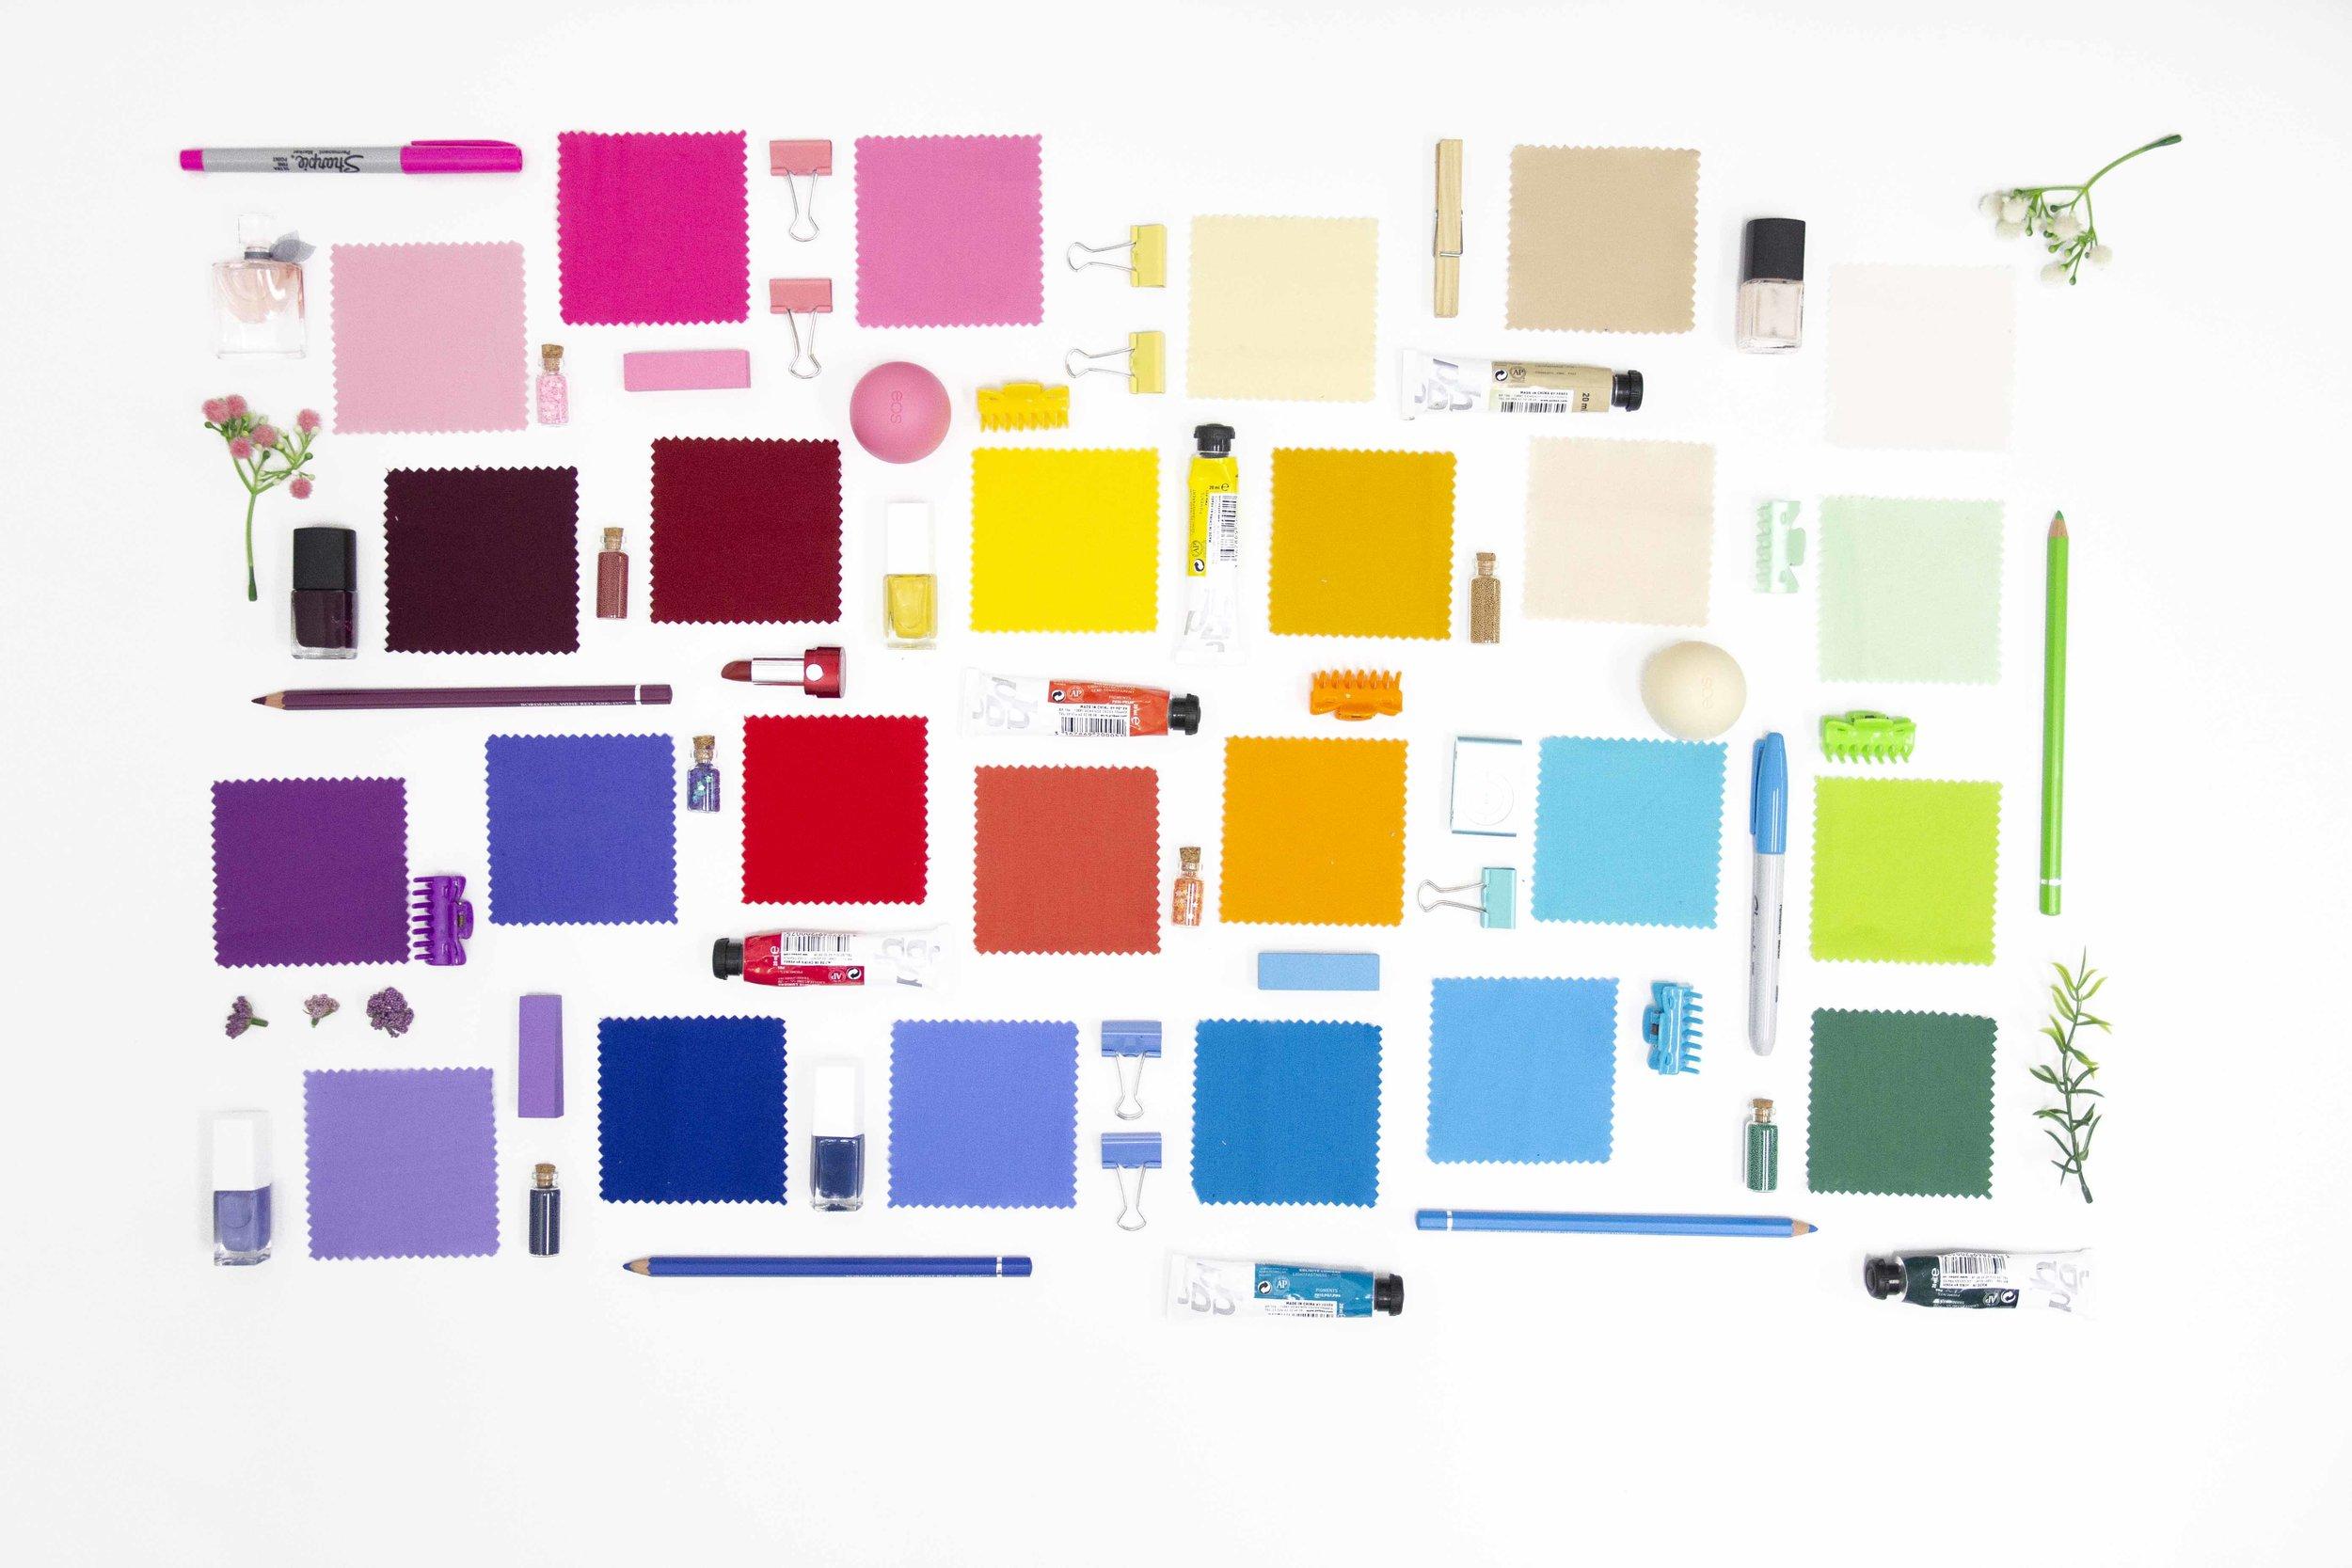 Colorworks_3x3b1.jpg